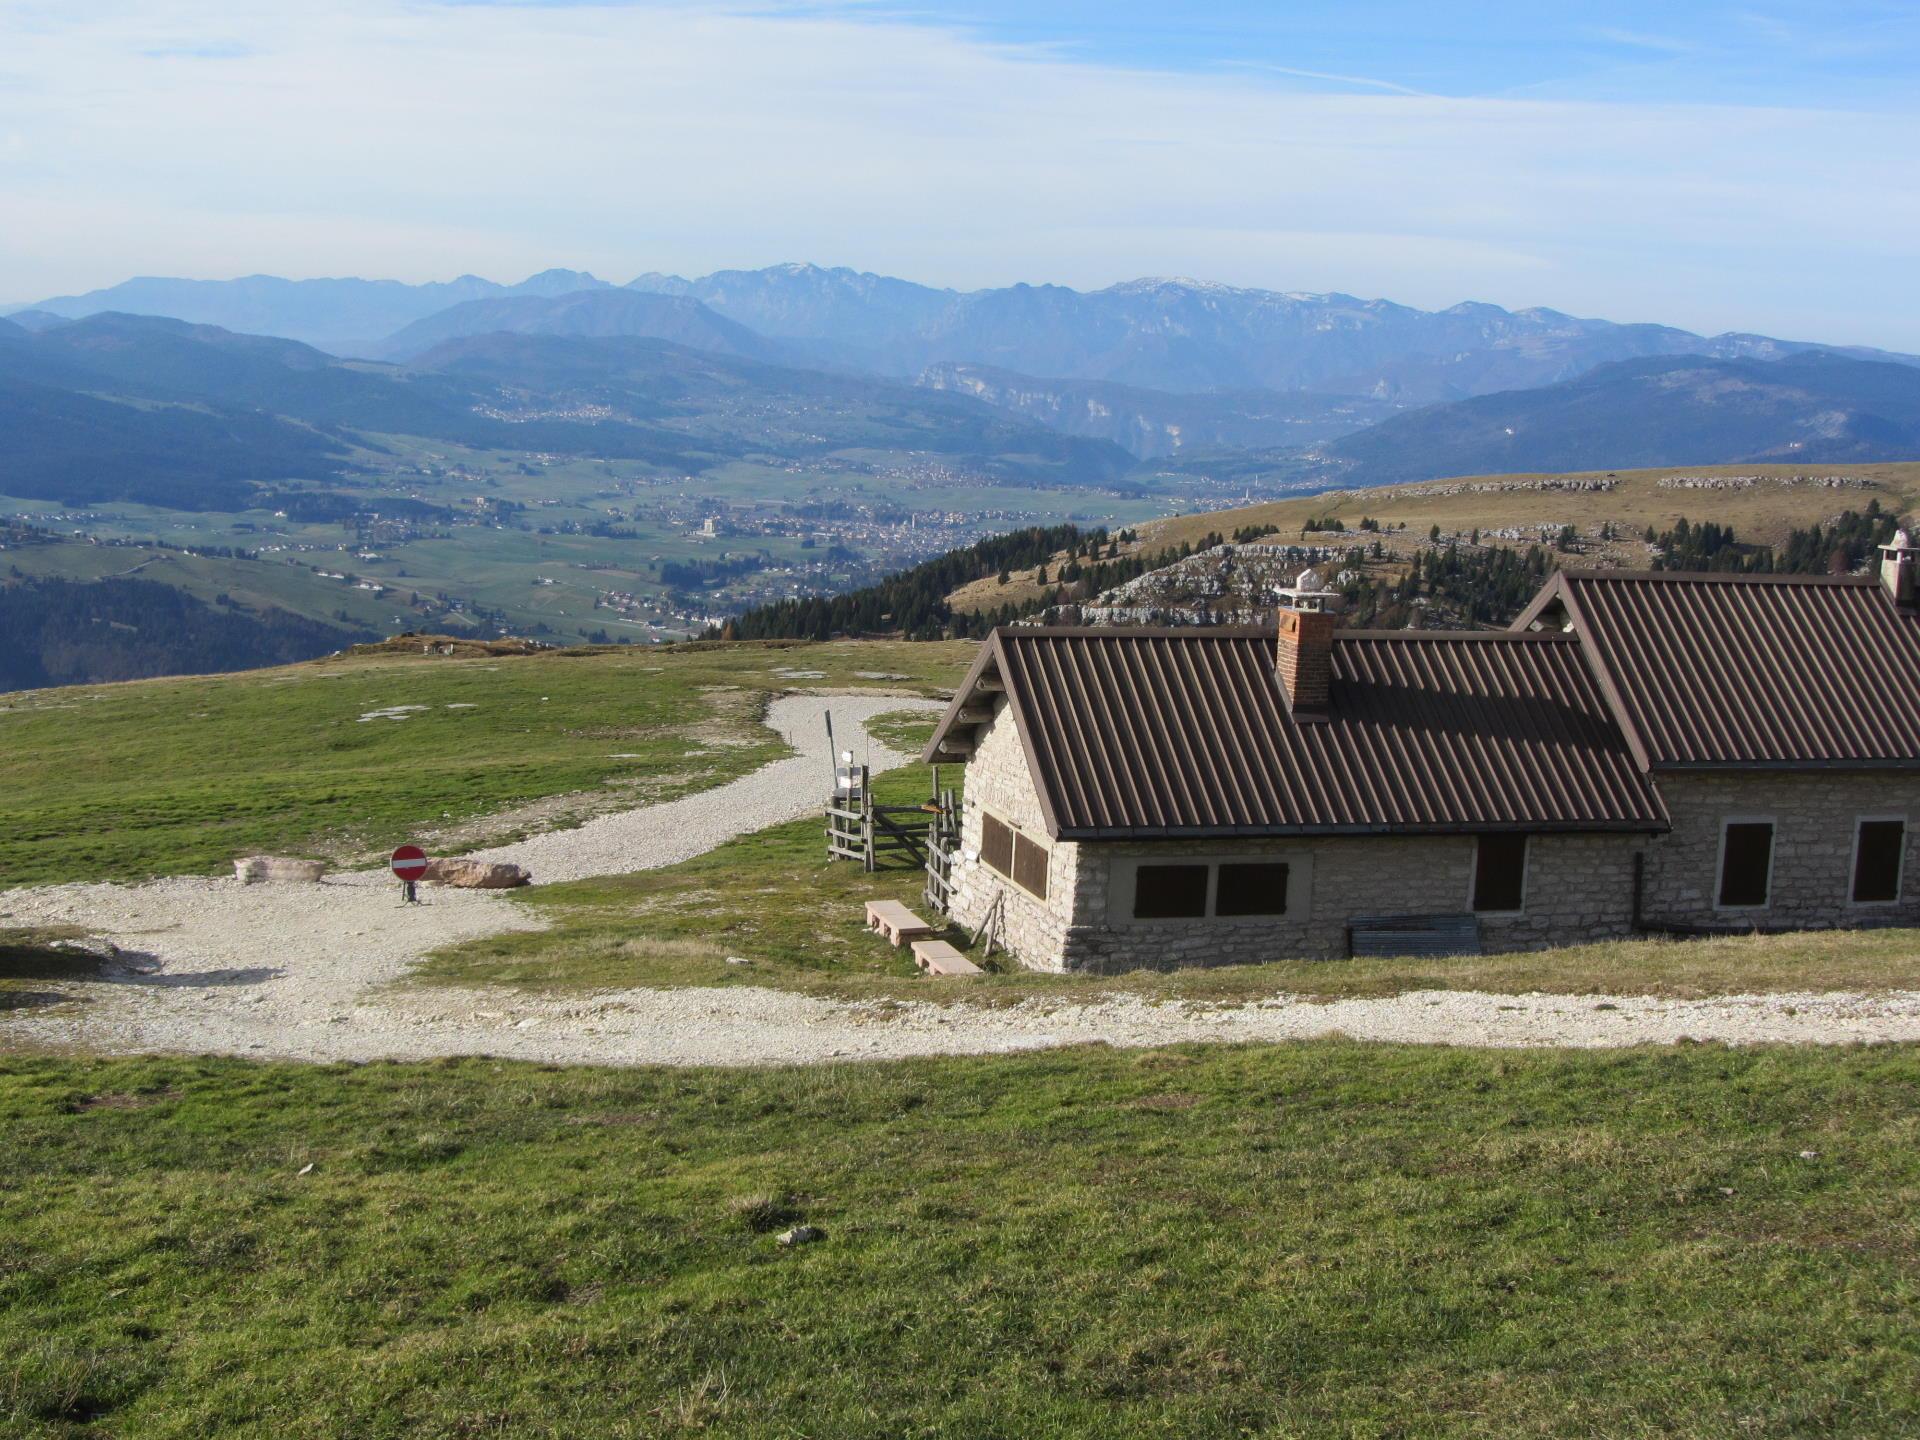 Da Casara Montagna Nova verso Asiago